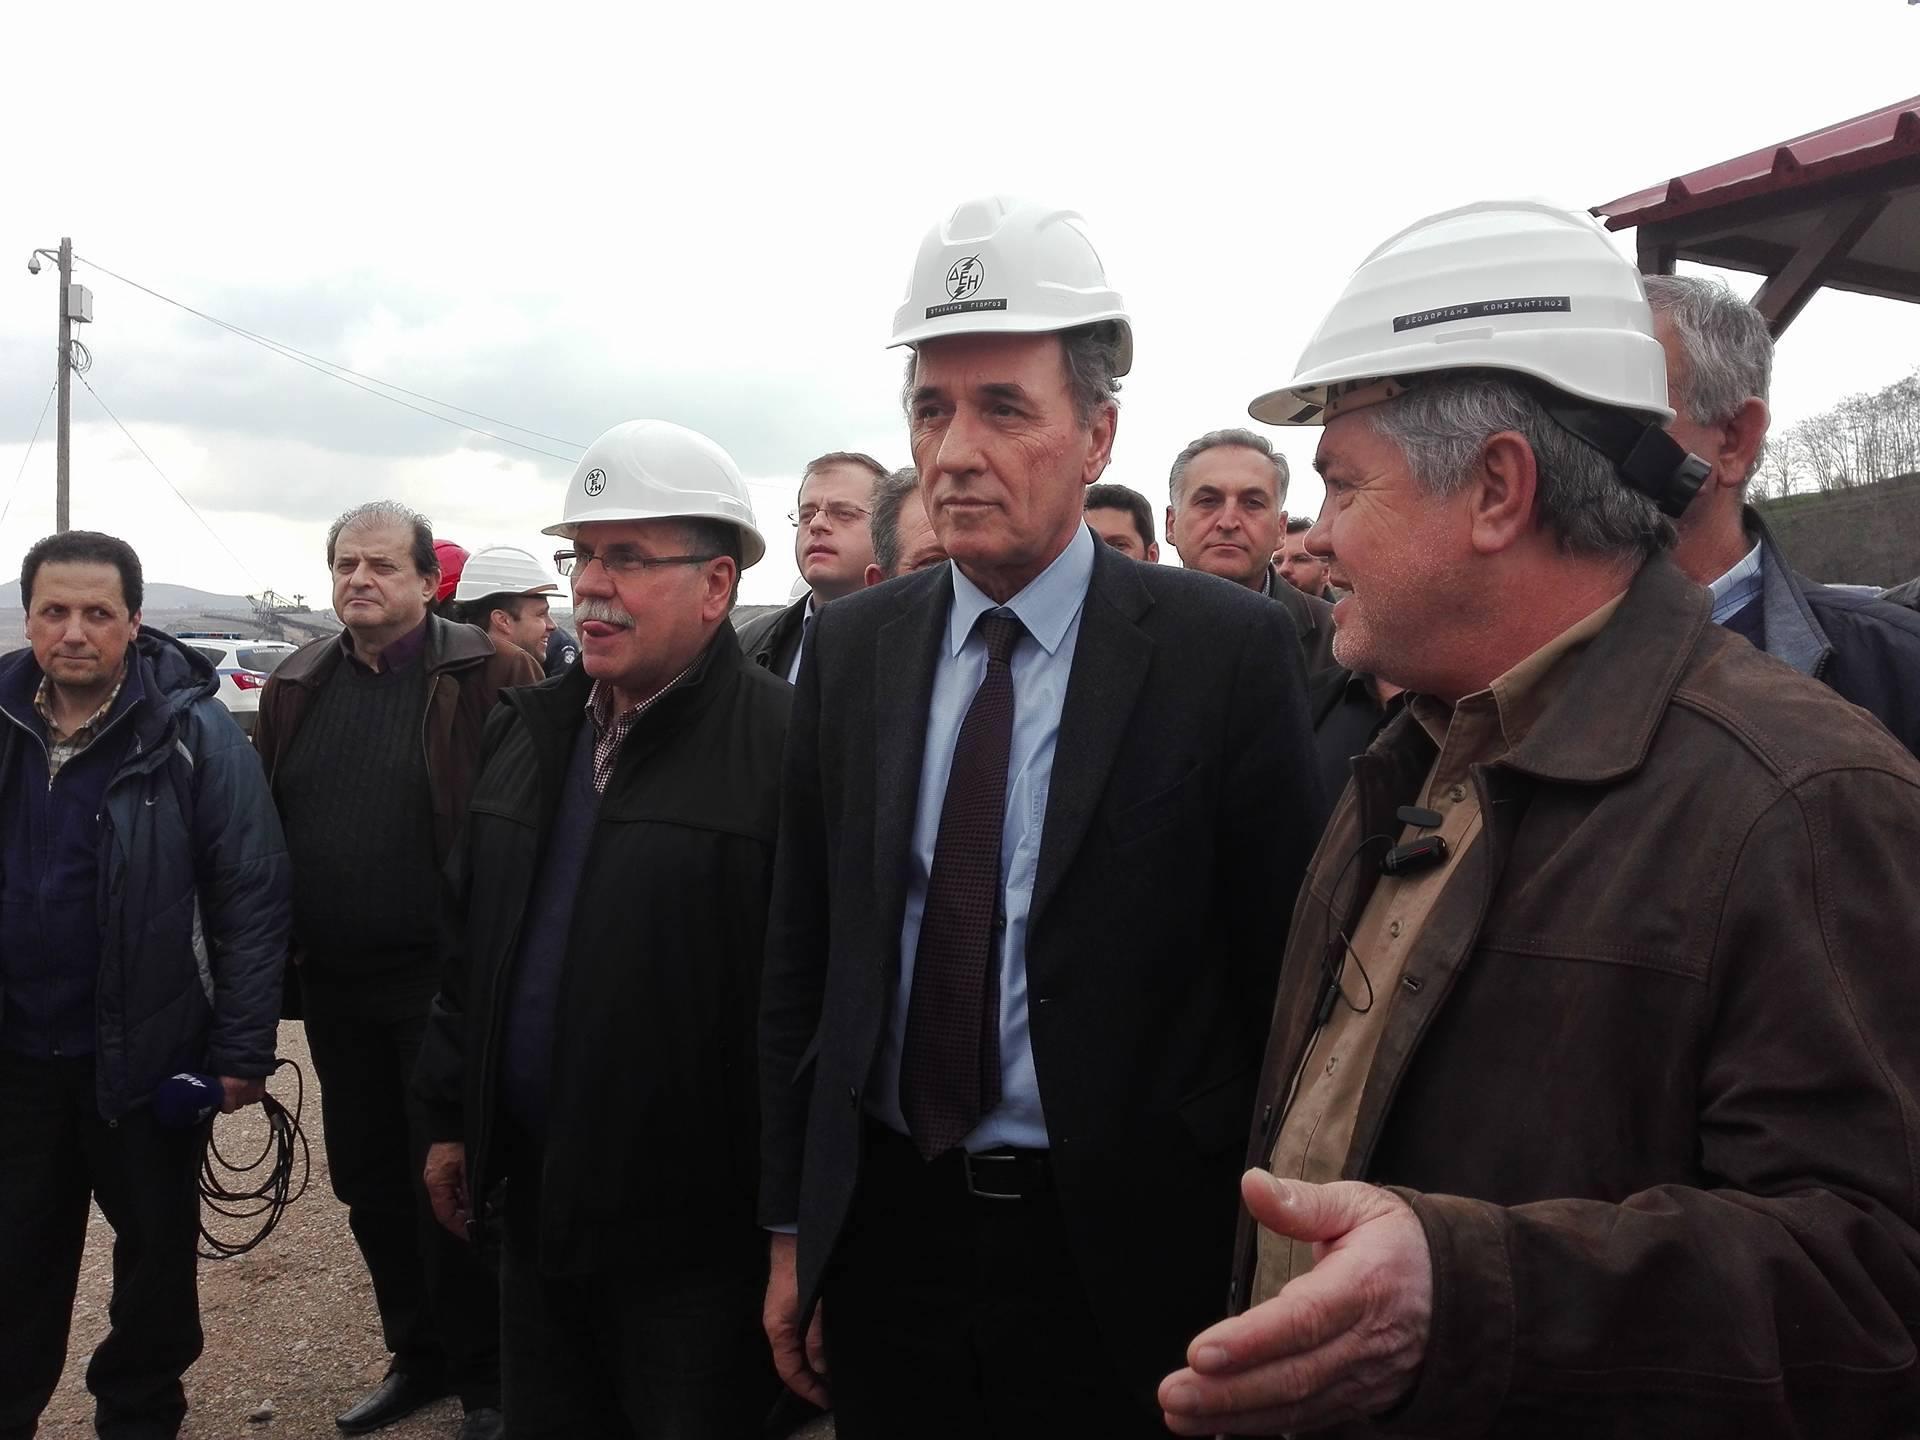 "kozan.gr: Στο Παρατηρητήριο Νοτίου Πεδίου της ΔΕΗ, ο Υπουργός Ενέργειας & Περιβάλλοντος, Γ. Σταθάκης: ""Είμαστε μπροστά σε πολύ δύσκολες αποφάσεις. Η Κυβέρνηση είναι αποφασισμένη να στηρίξει της ΔΕΗ""  (Βίντεο & Φωτογραφίες)"